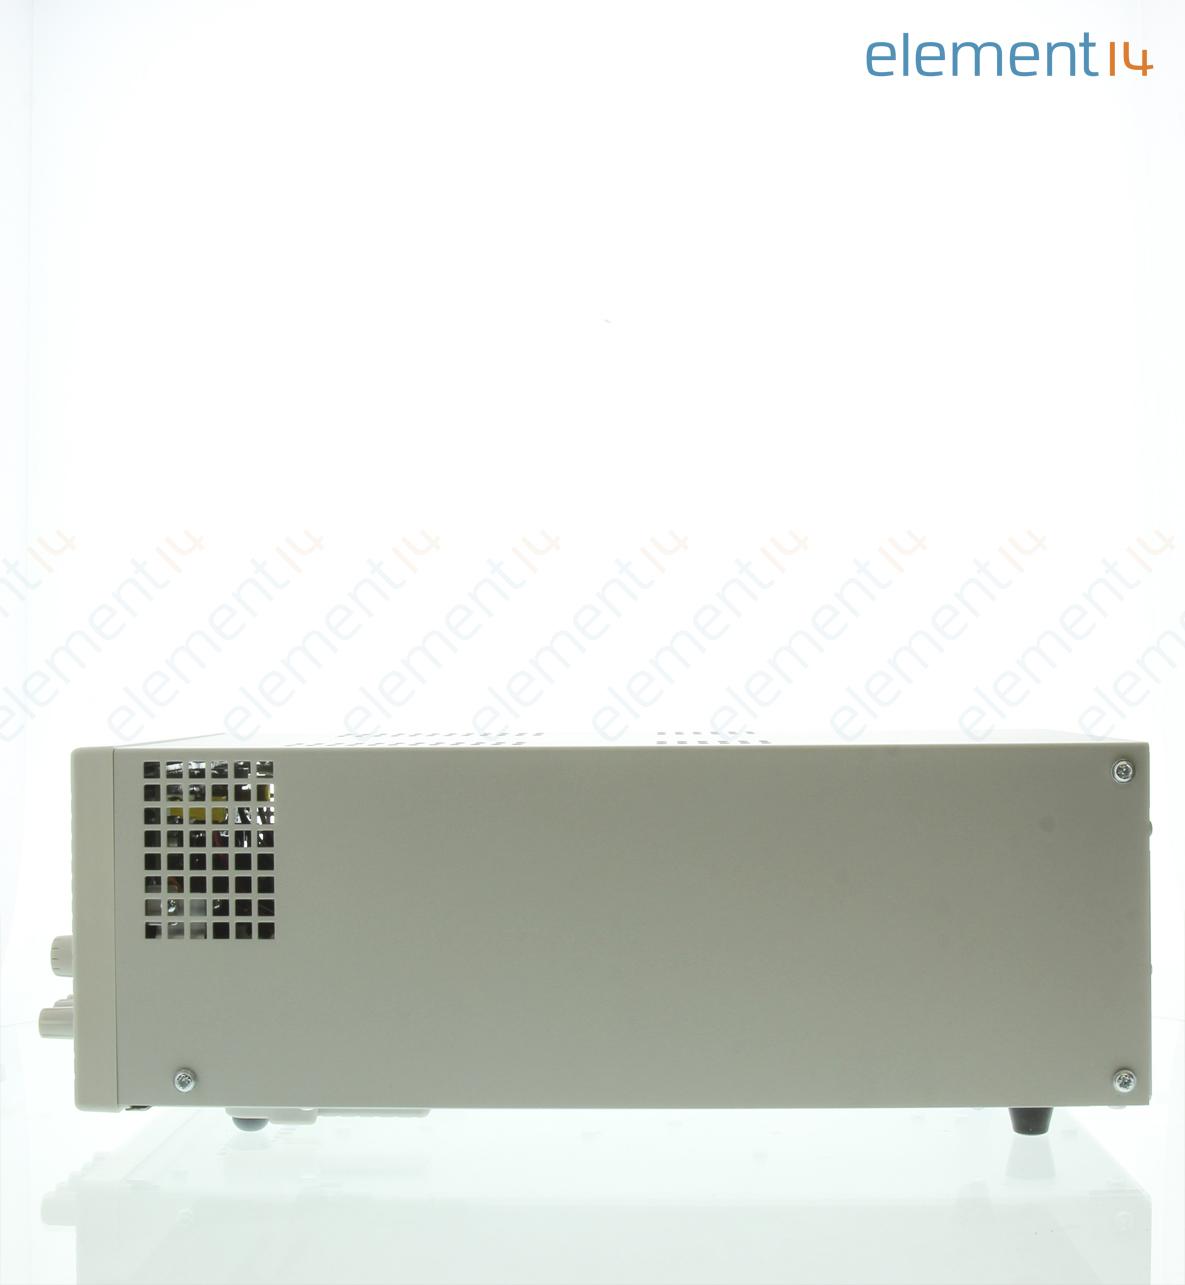 Cpx400dp Aim Tti Instruments Bench Power Supply Powerflex Bus Supplies Gt Dual Low Voltage Circuit Breaker